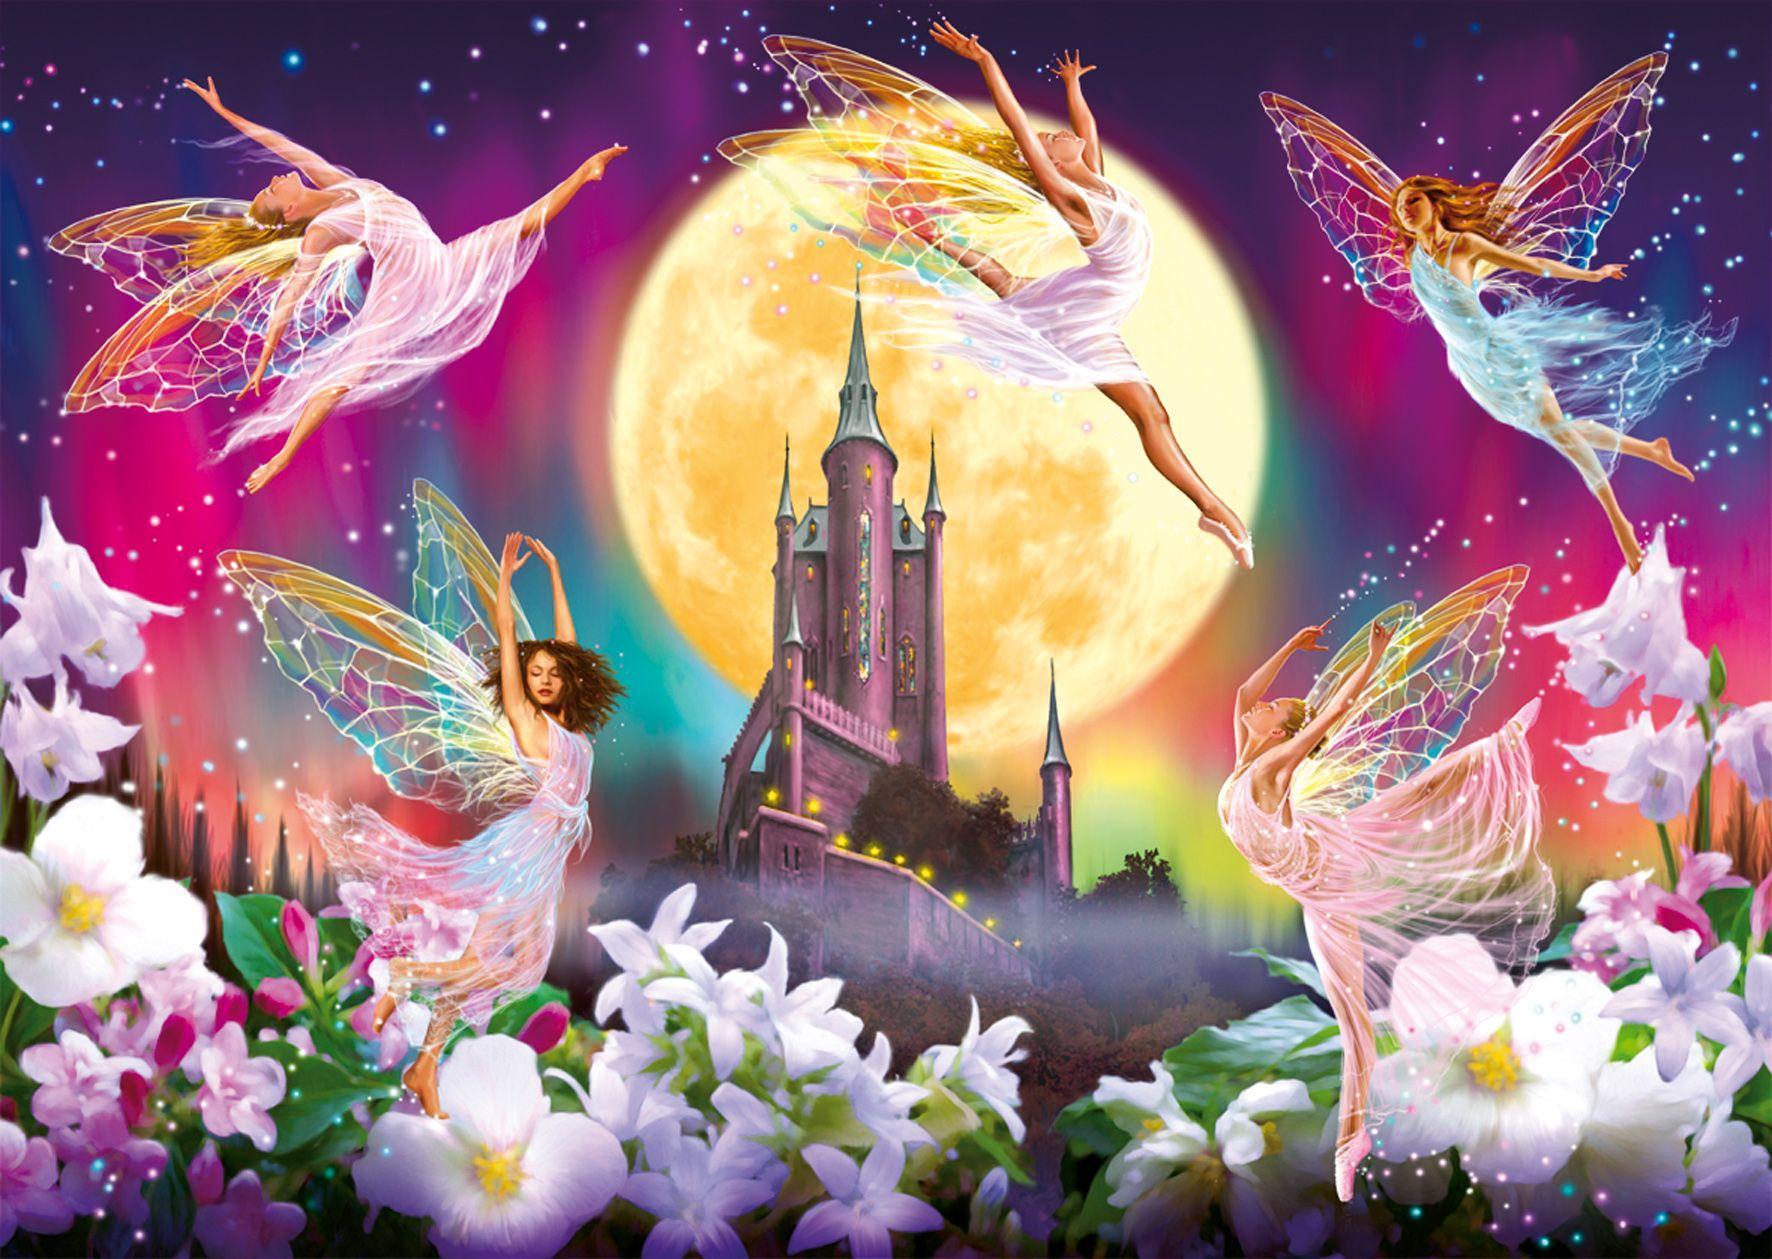 3d Cute Disney Wallpapers Top Free 3d Cute Disney Backgrounds Wallpaperaccess